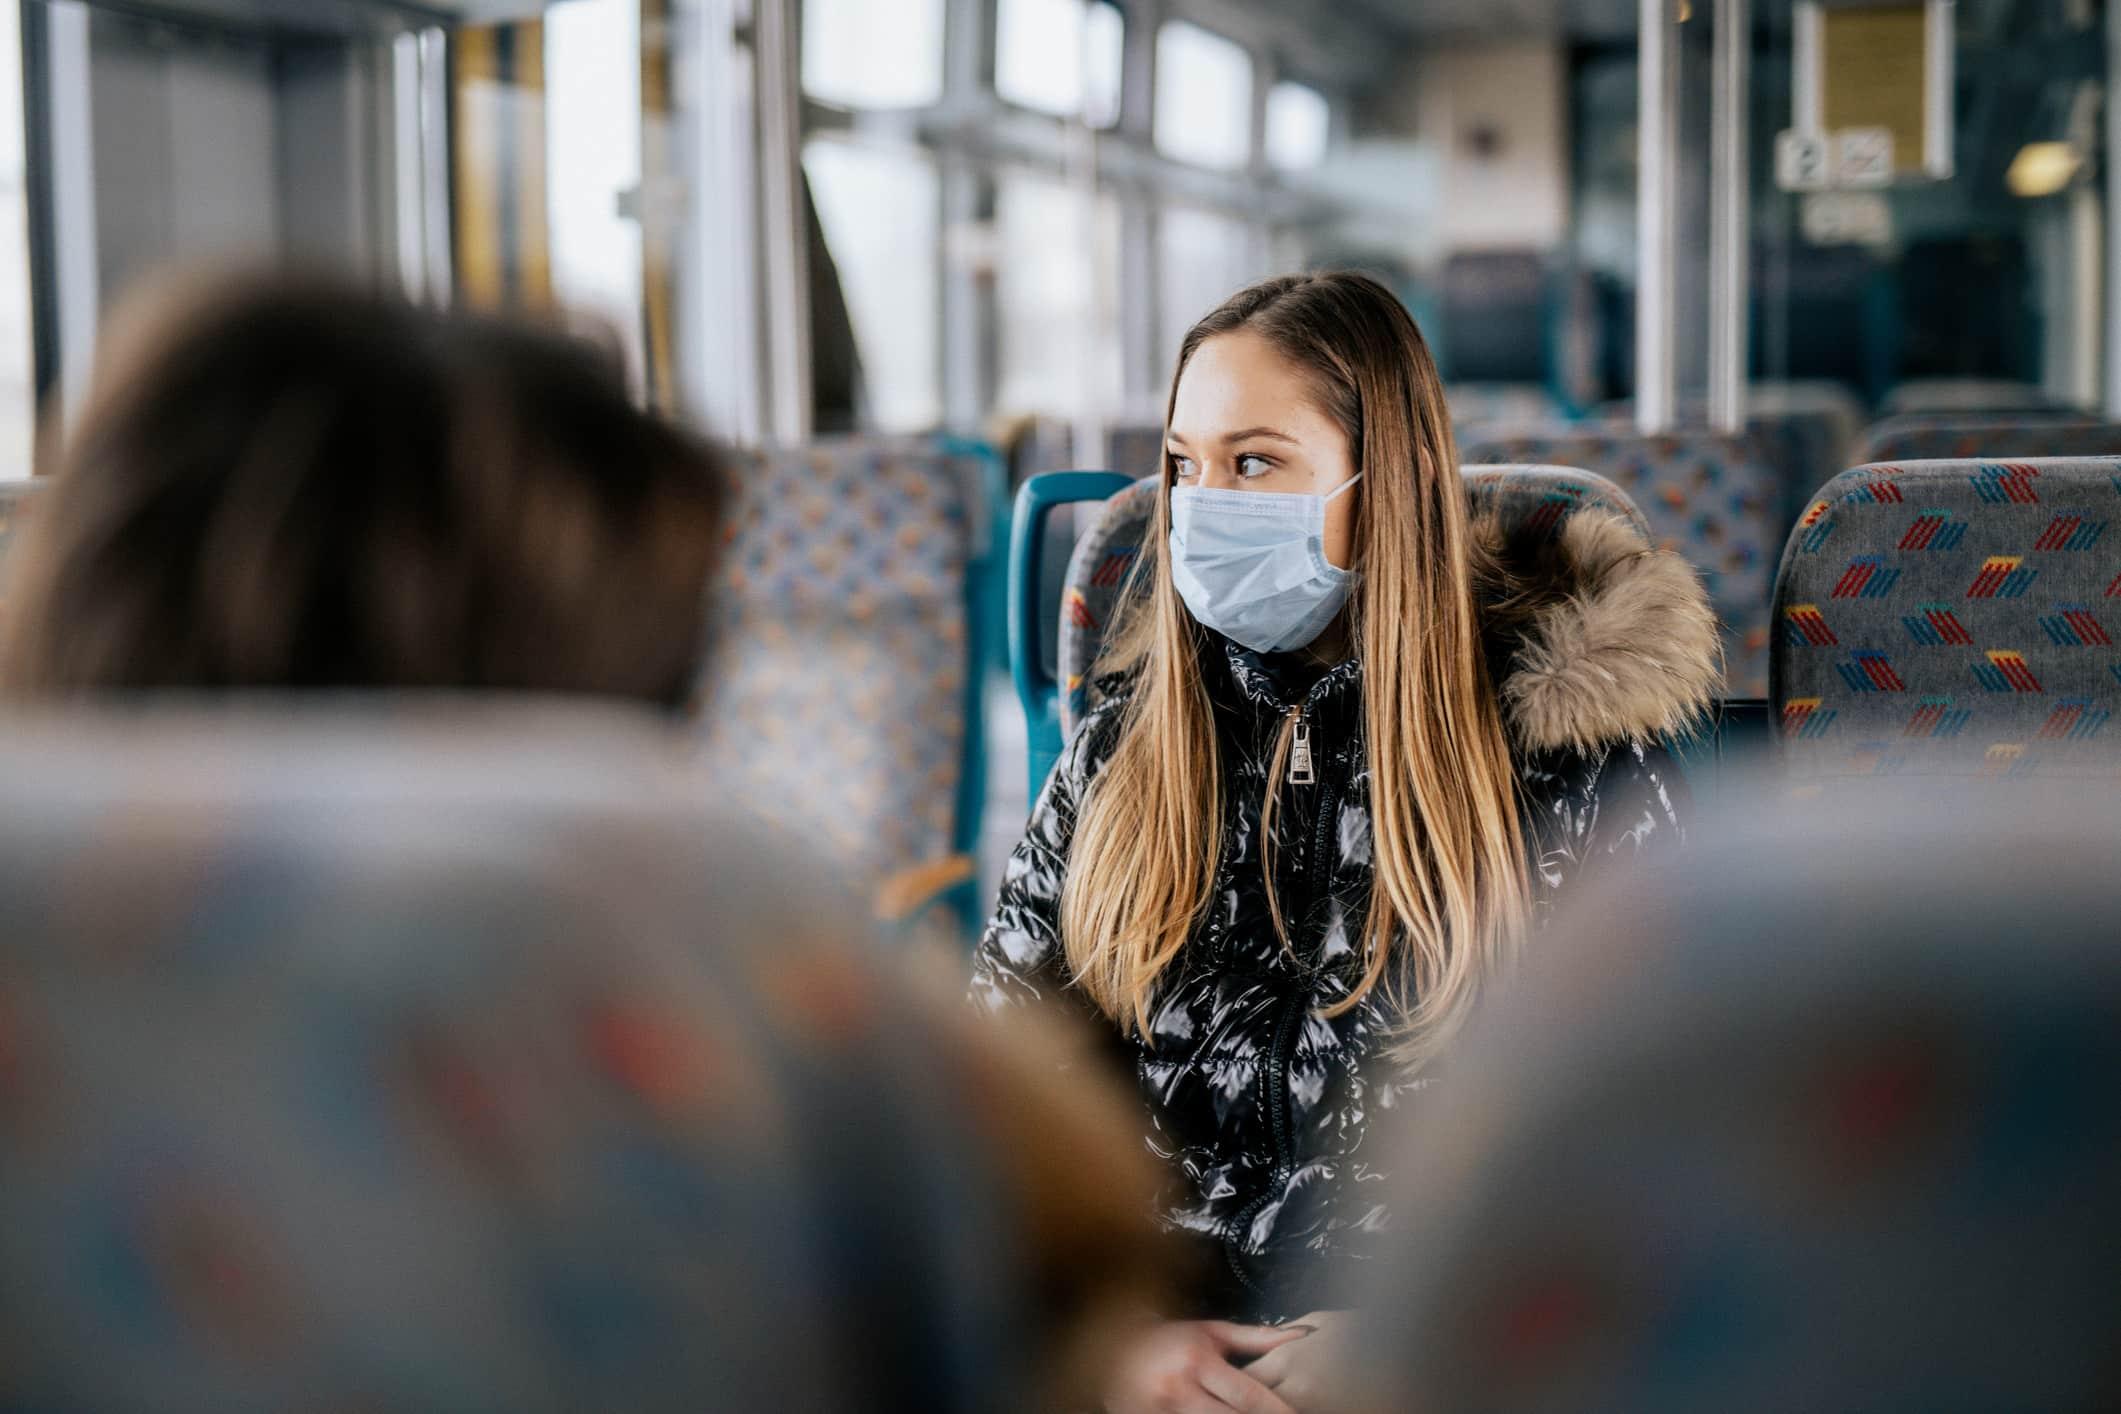 Woman wearing a mask on a train